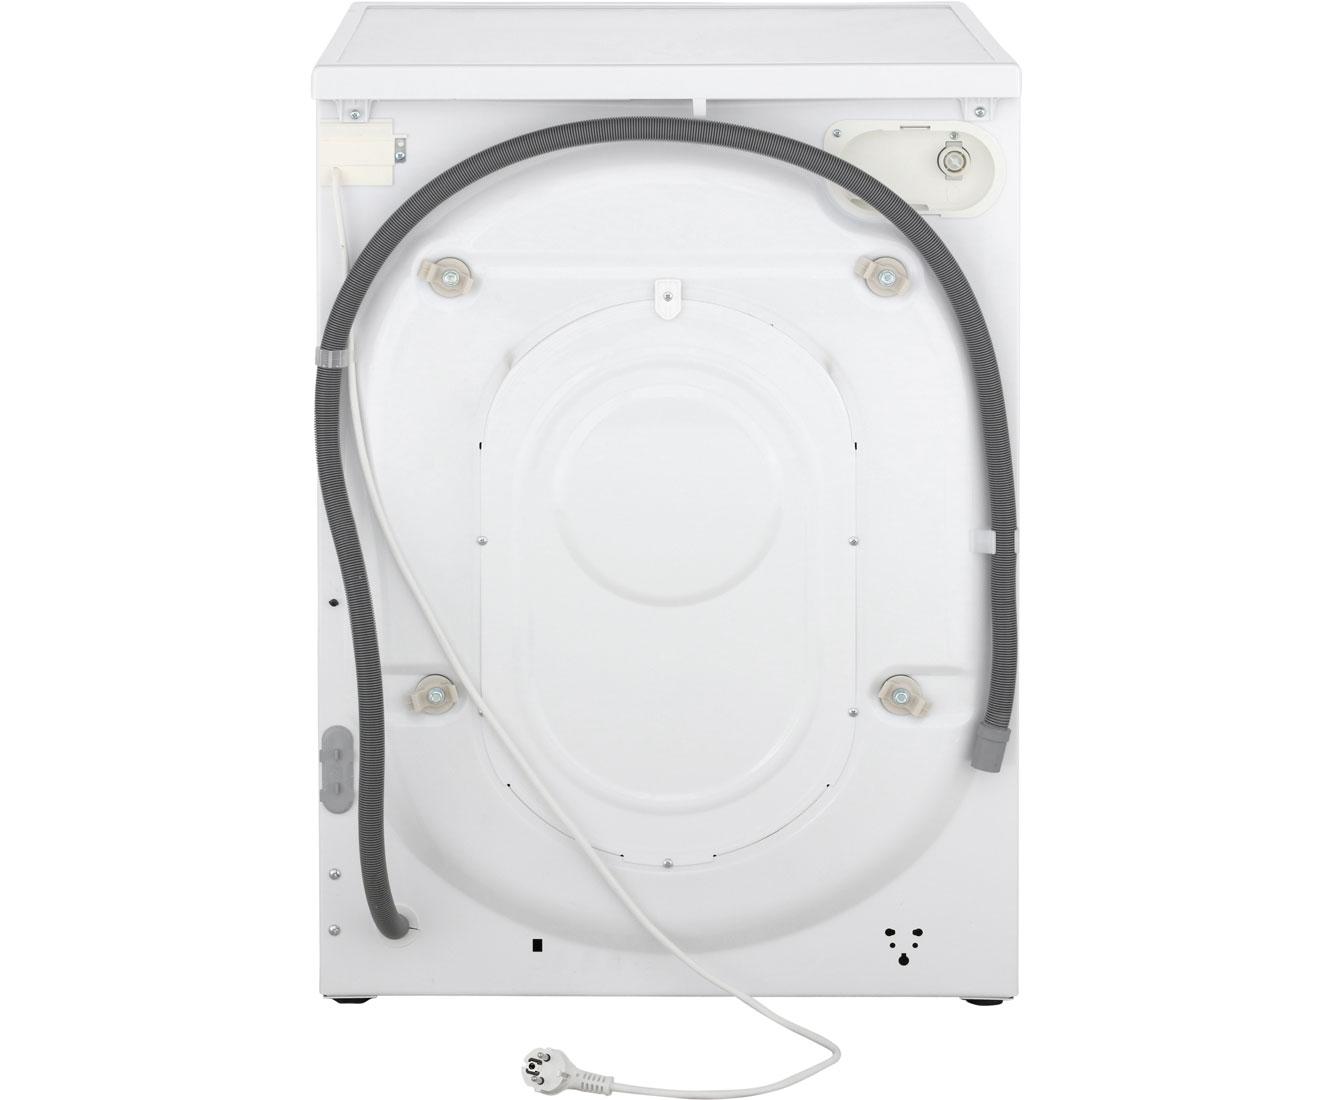 Bauknecht fwl 8f4 waschmaschine freistehend weiss neu ebay